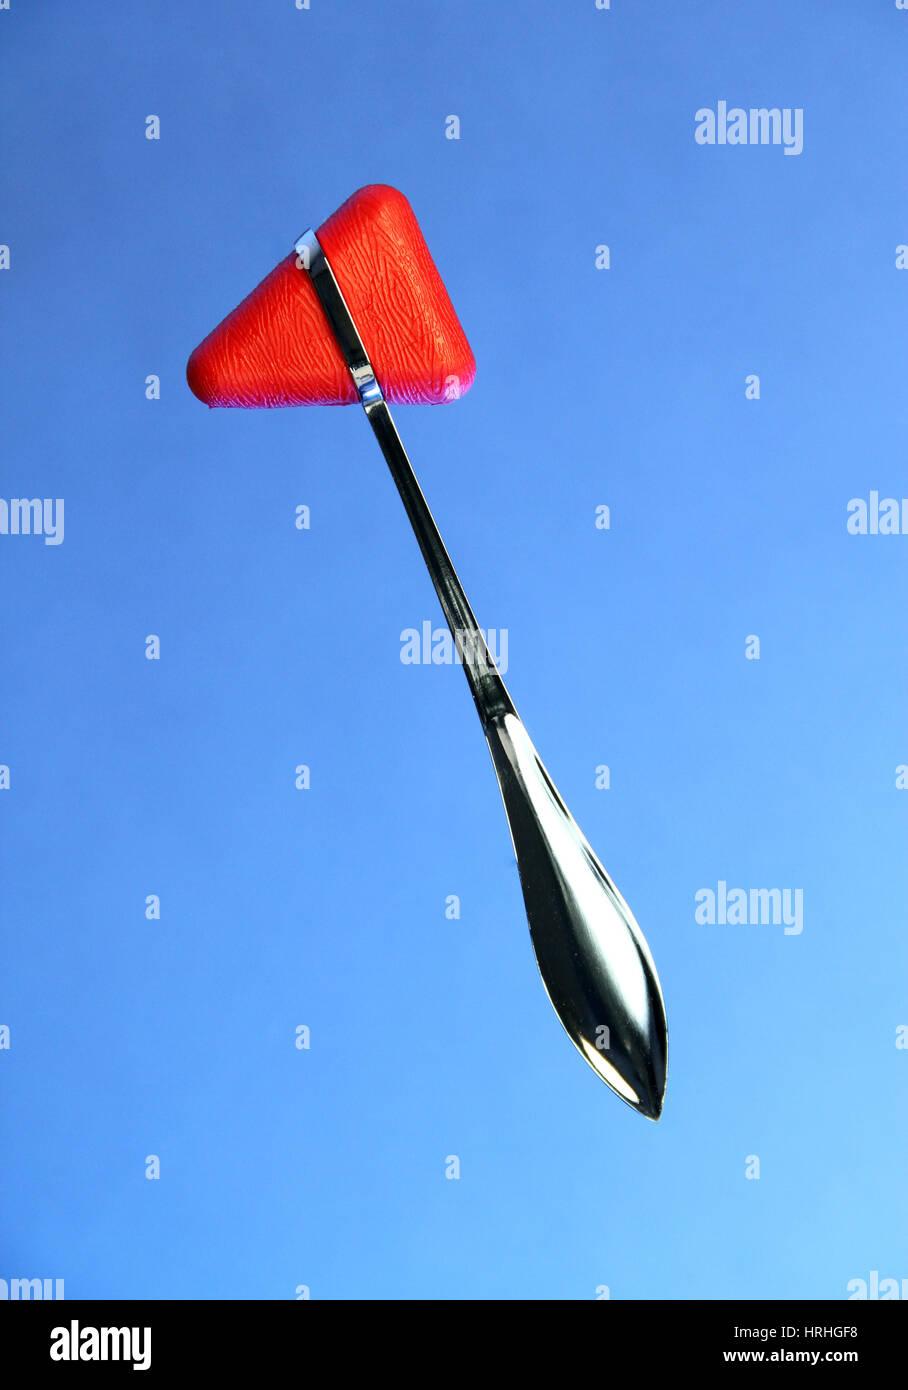 Taylor Reflex Hammer - Stock Image